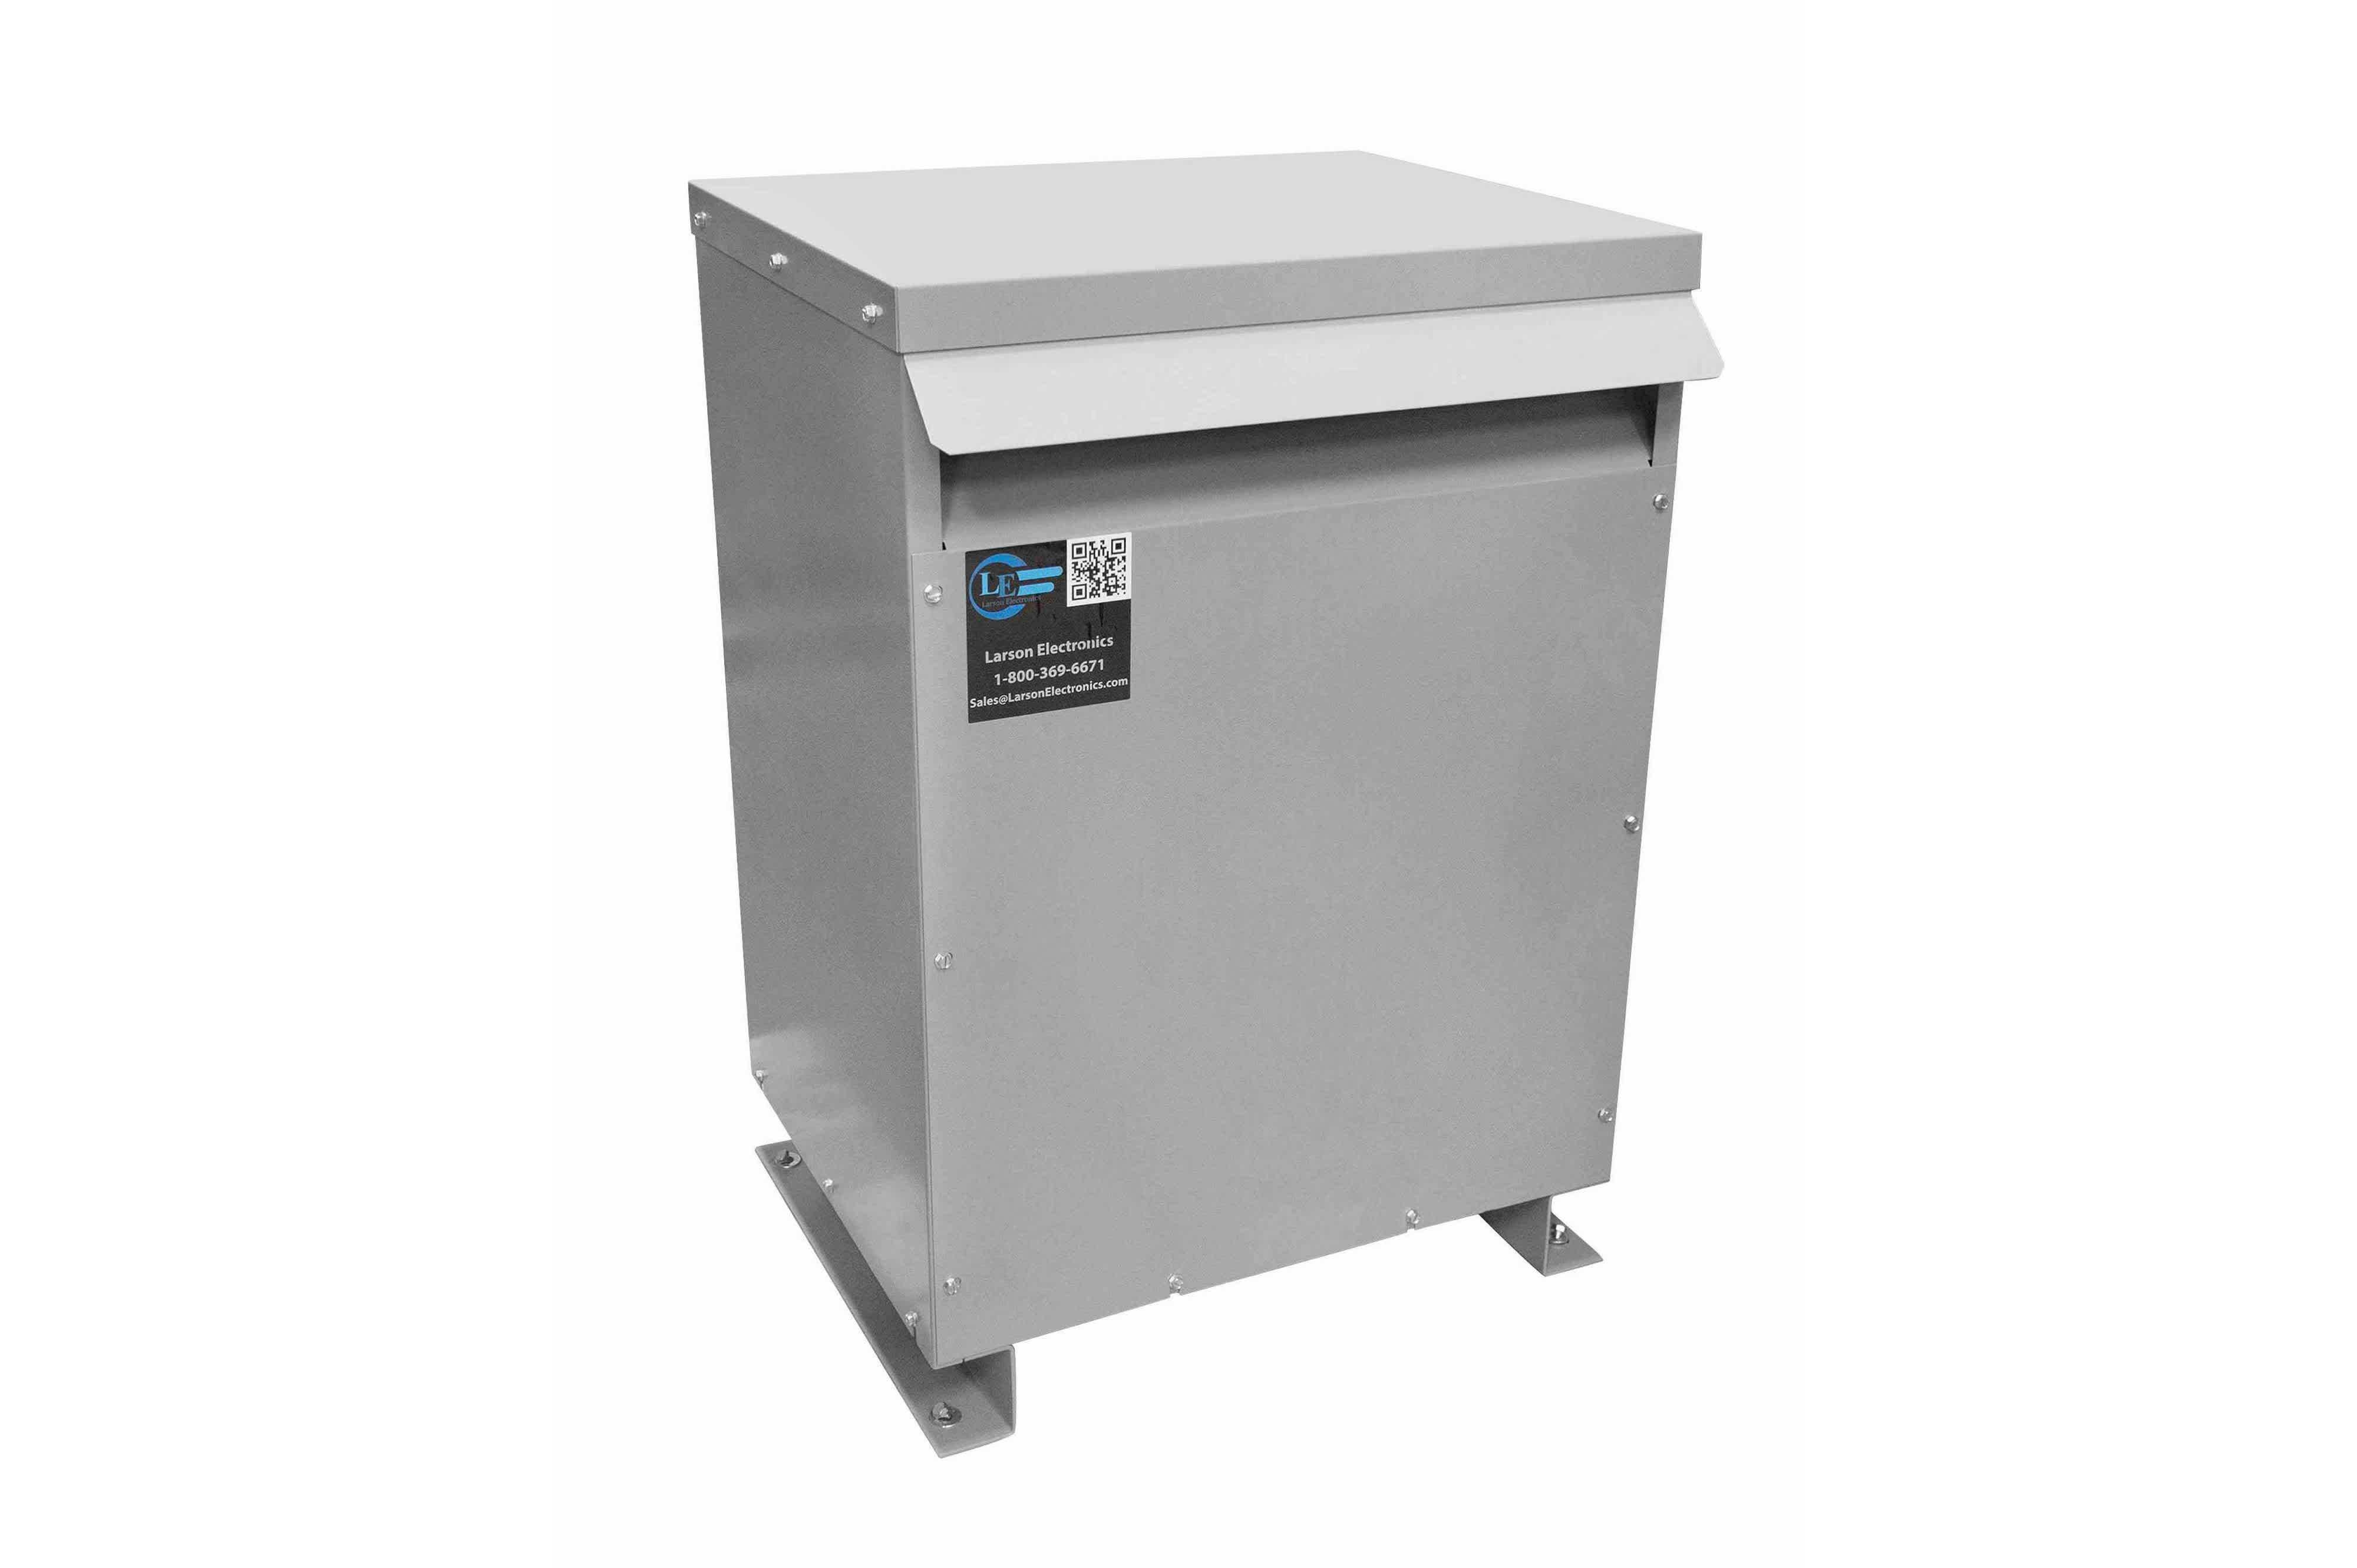 250 kVA 3PH Isolation Transformer, 480V Wye Primary, 415V Delta Secondary, N3R, Ventilated, 60 Hz